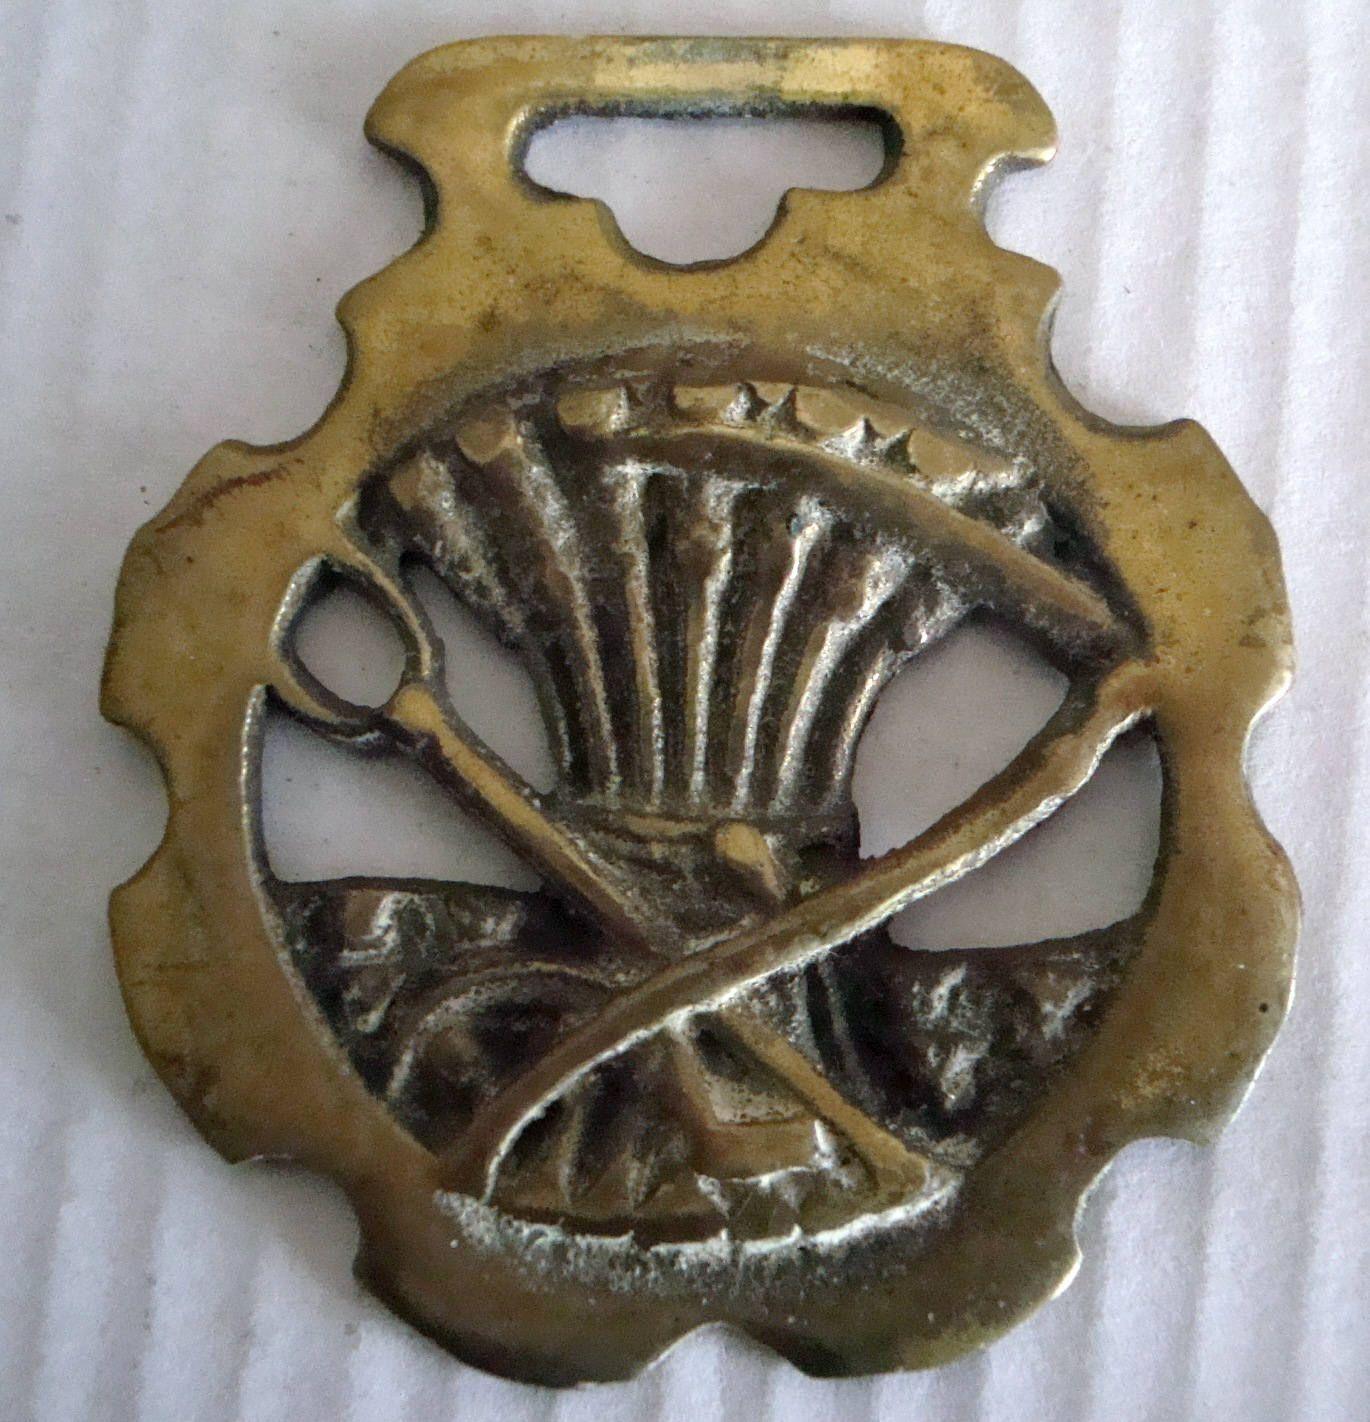 Vintage Horse Brass Tacklivery Medallion Wheatsheaf With Scythe